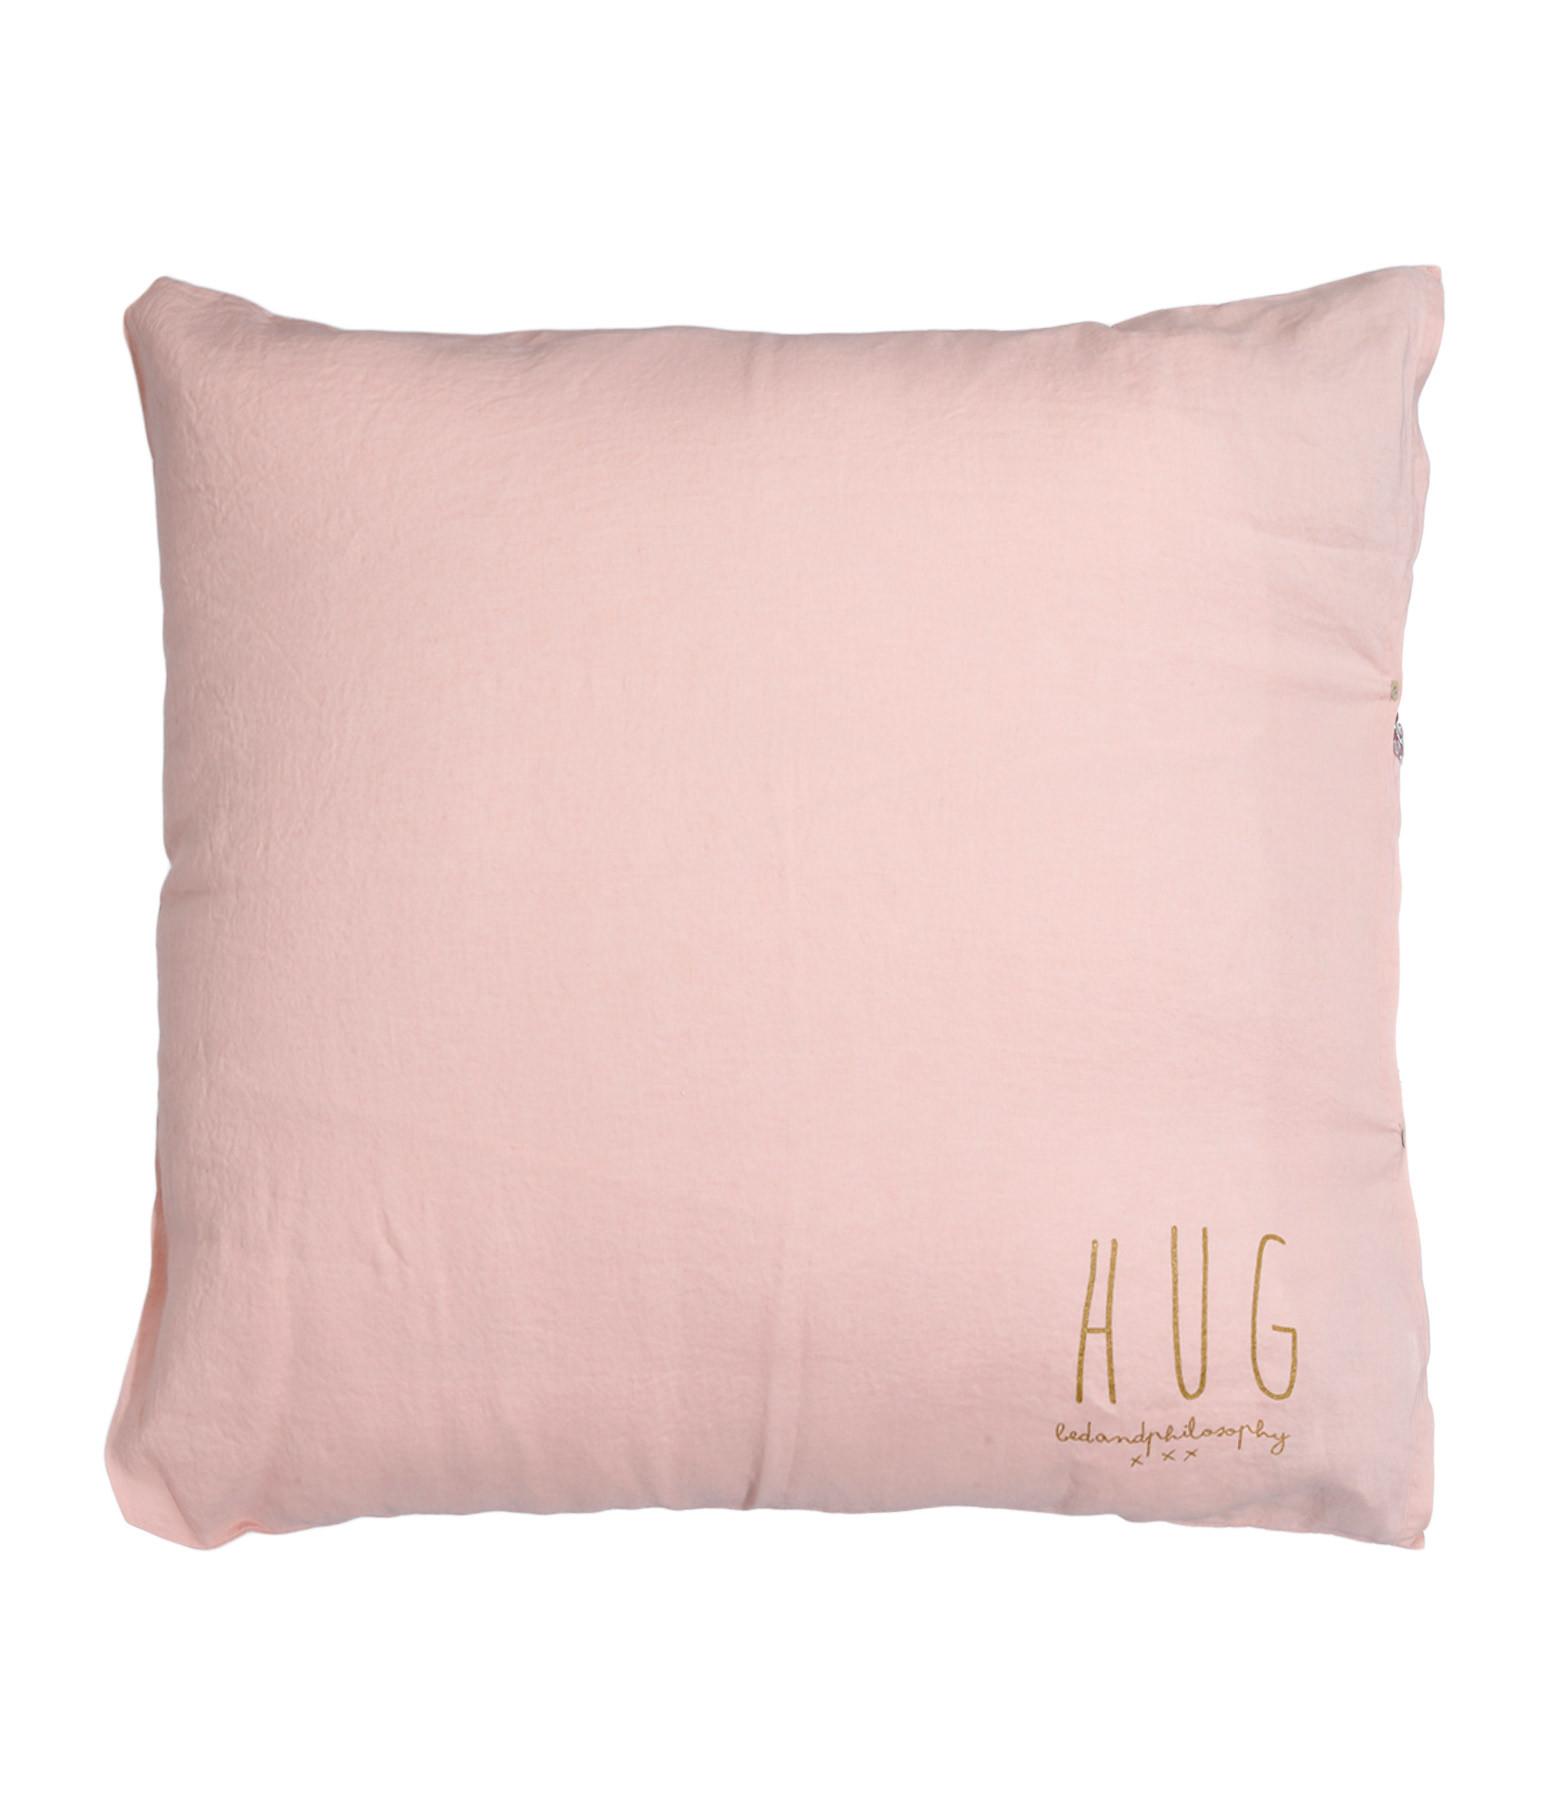 grand coussin hug lin blush bed and philosophy. Black Bedroom Furniture Sets. Home Design Ideas